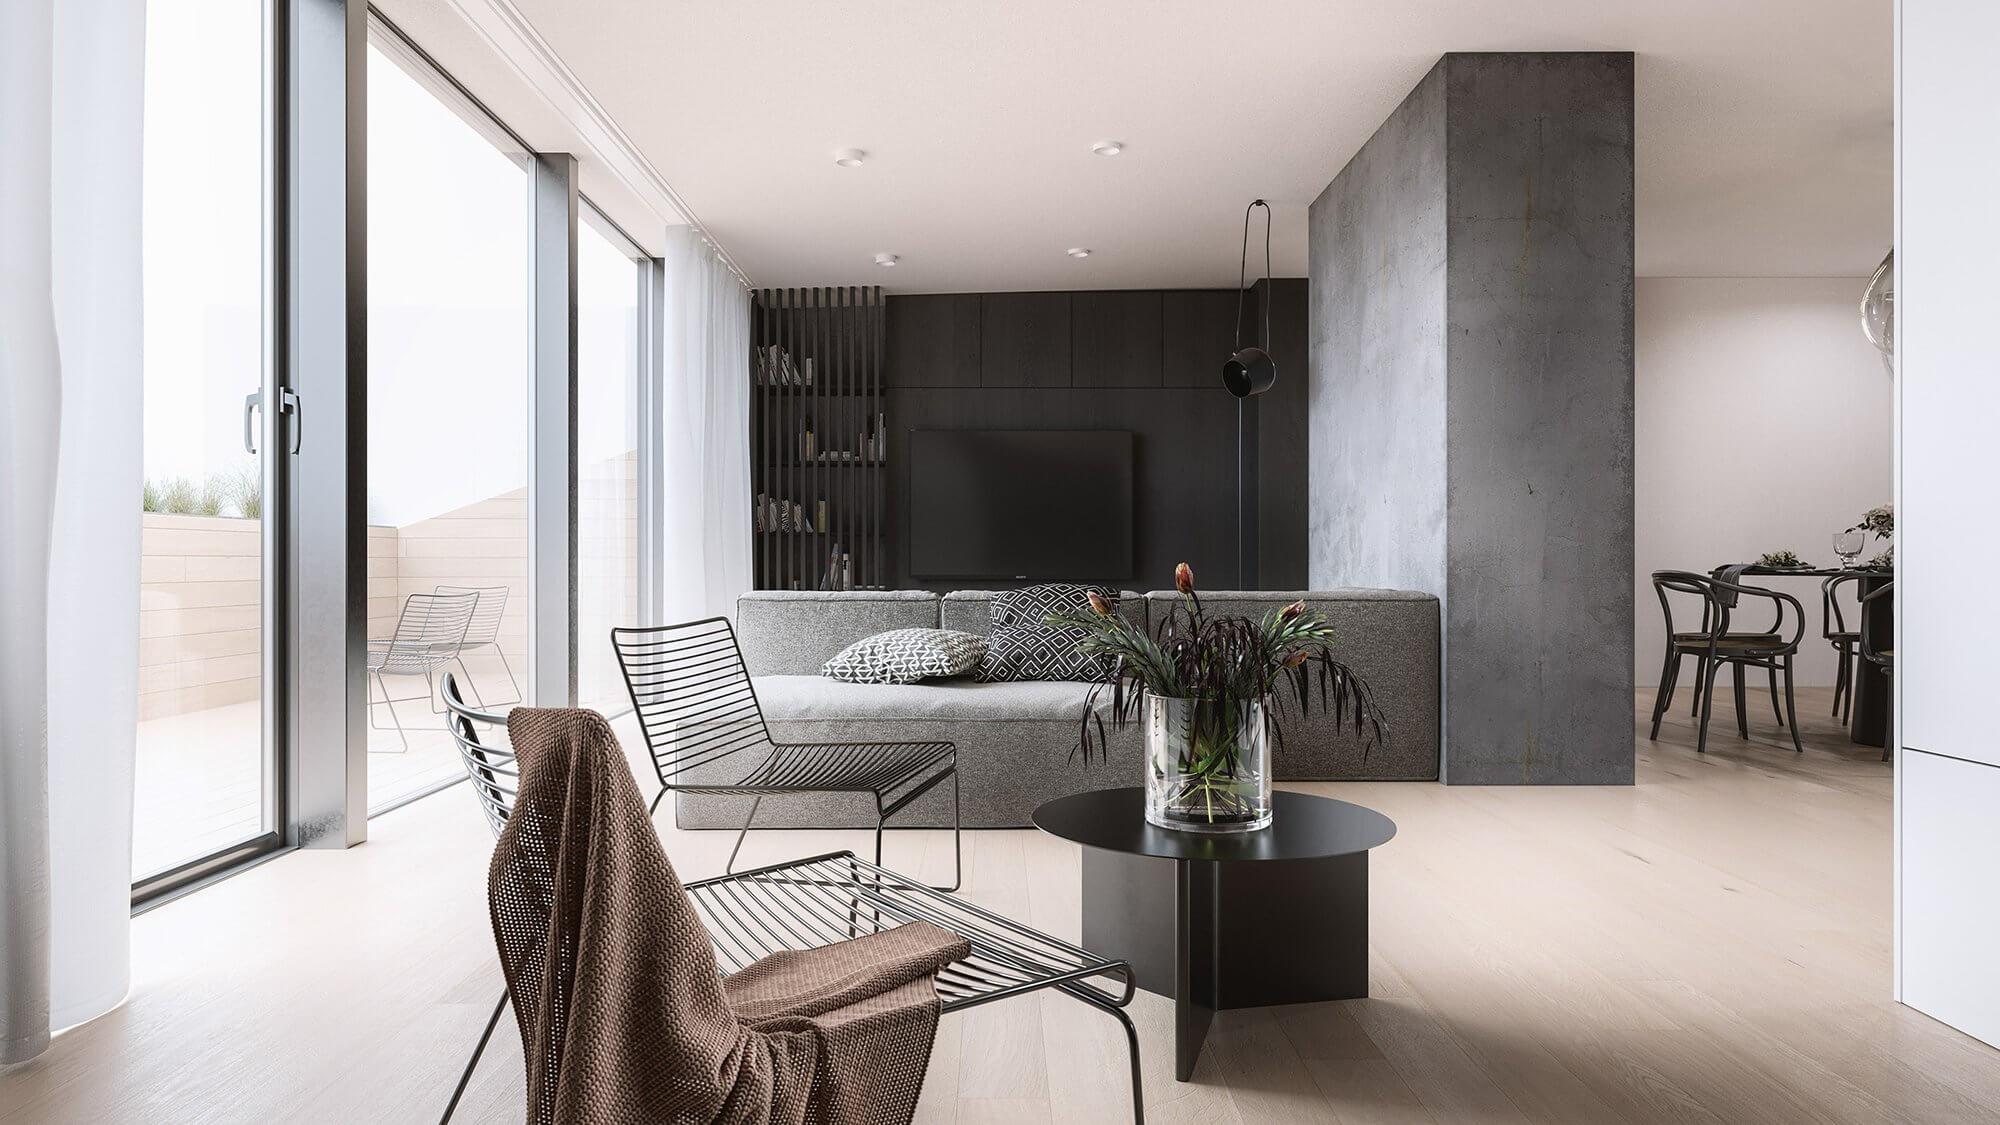 Mánesova Designer Apartment lounge area living room - cgi visualization